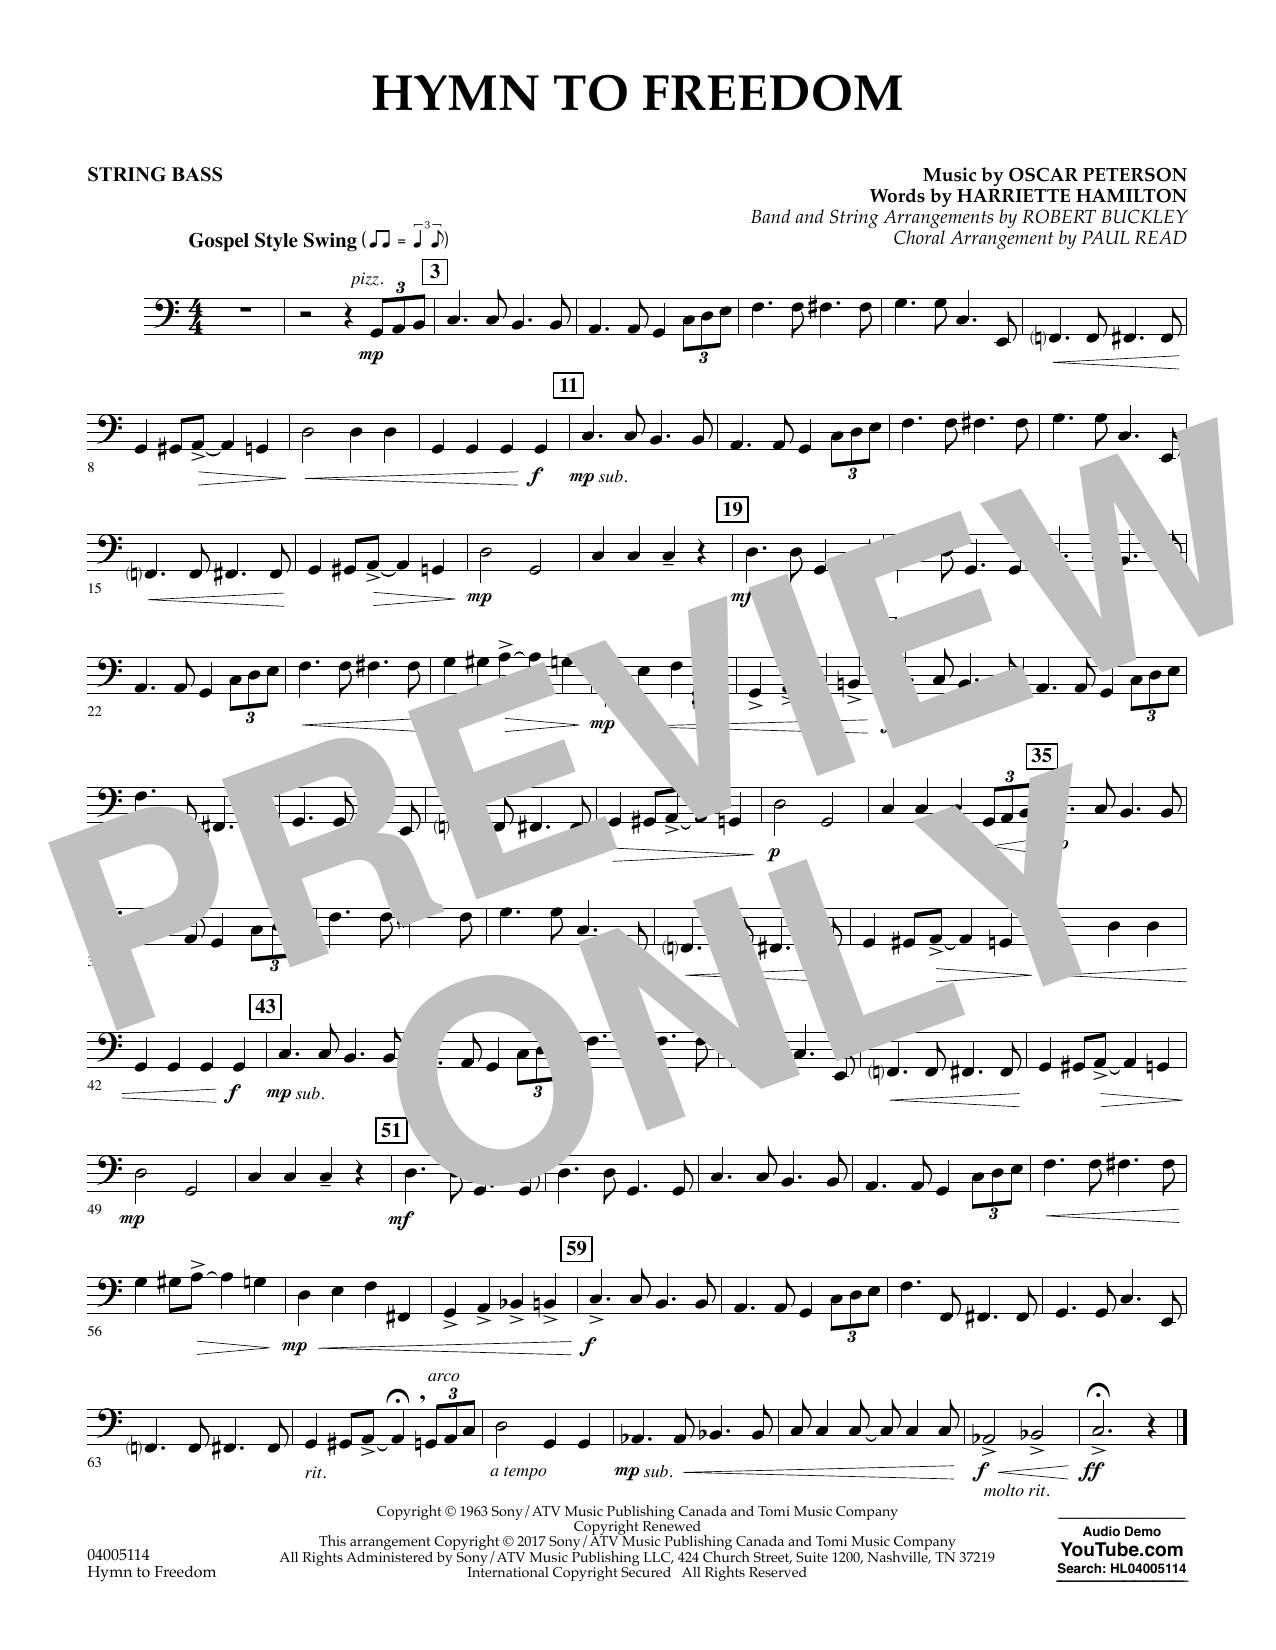 Hymn to Freedom - String Bass (Flex-Band)